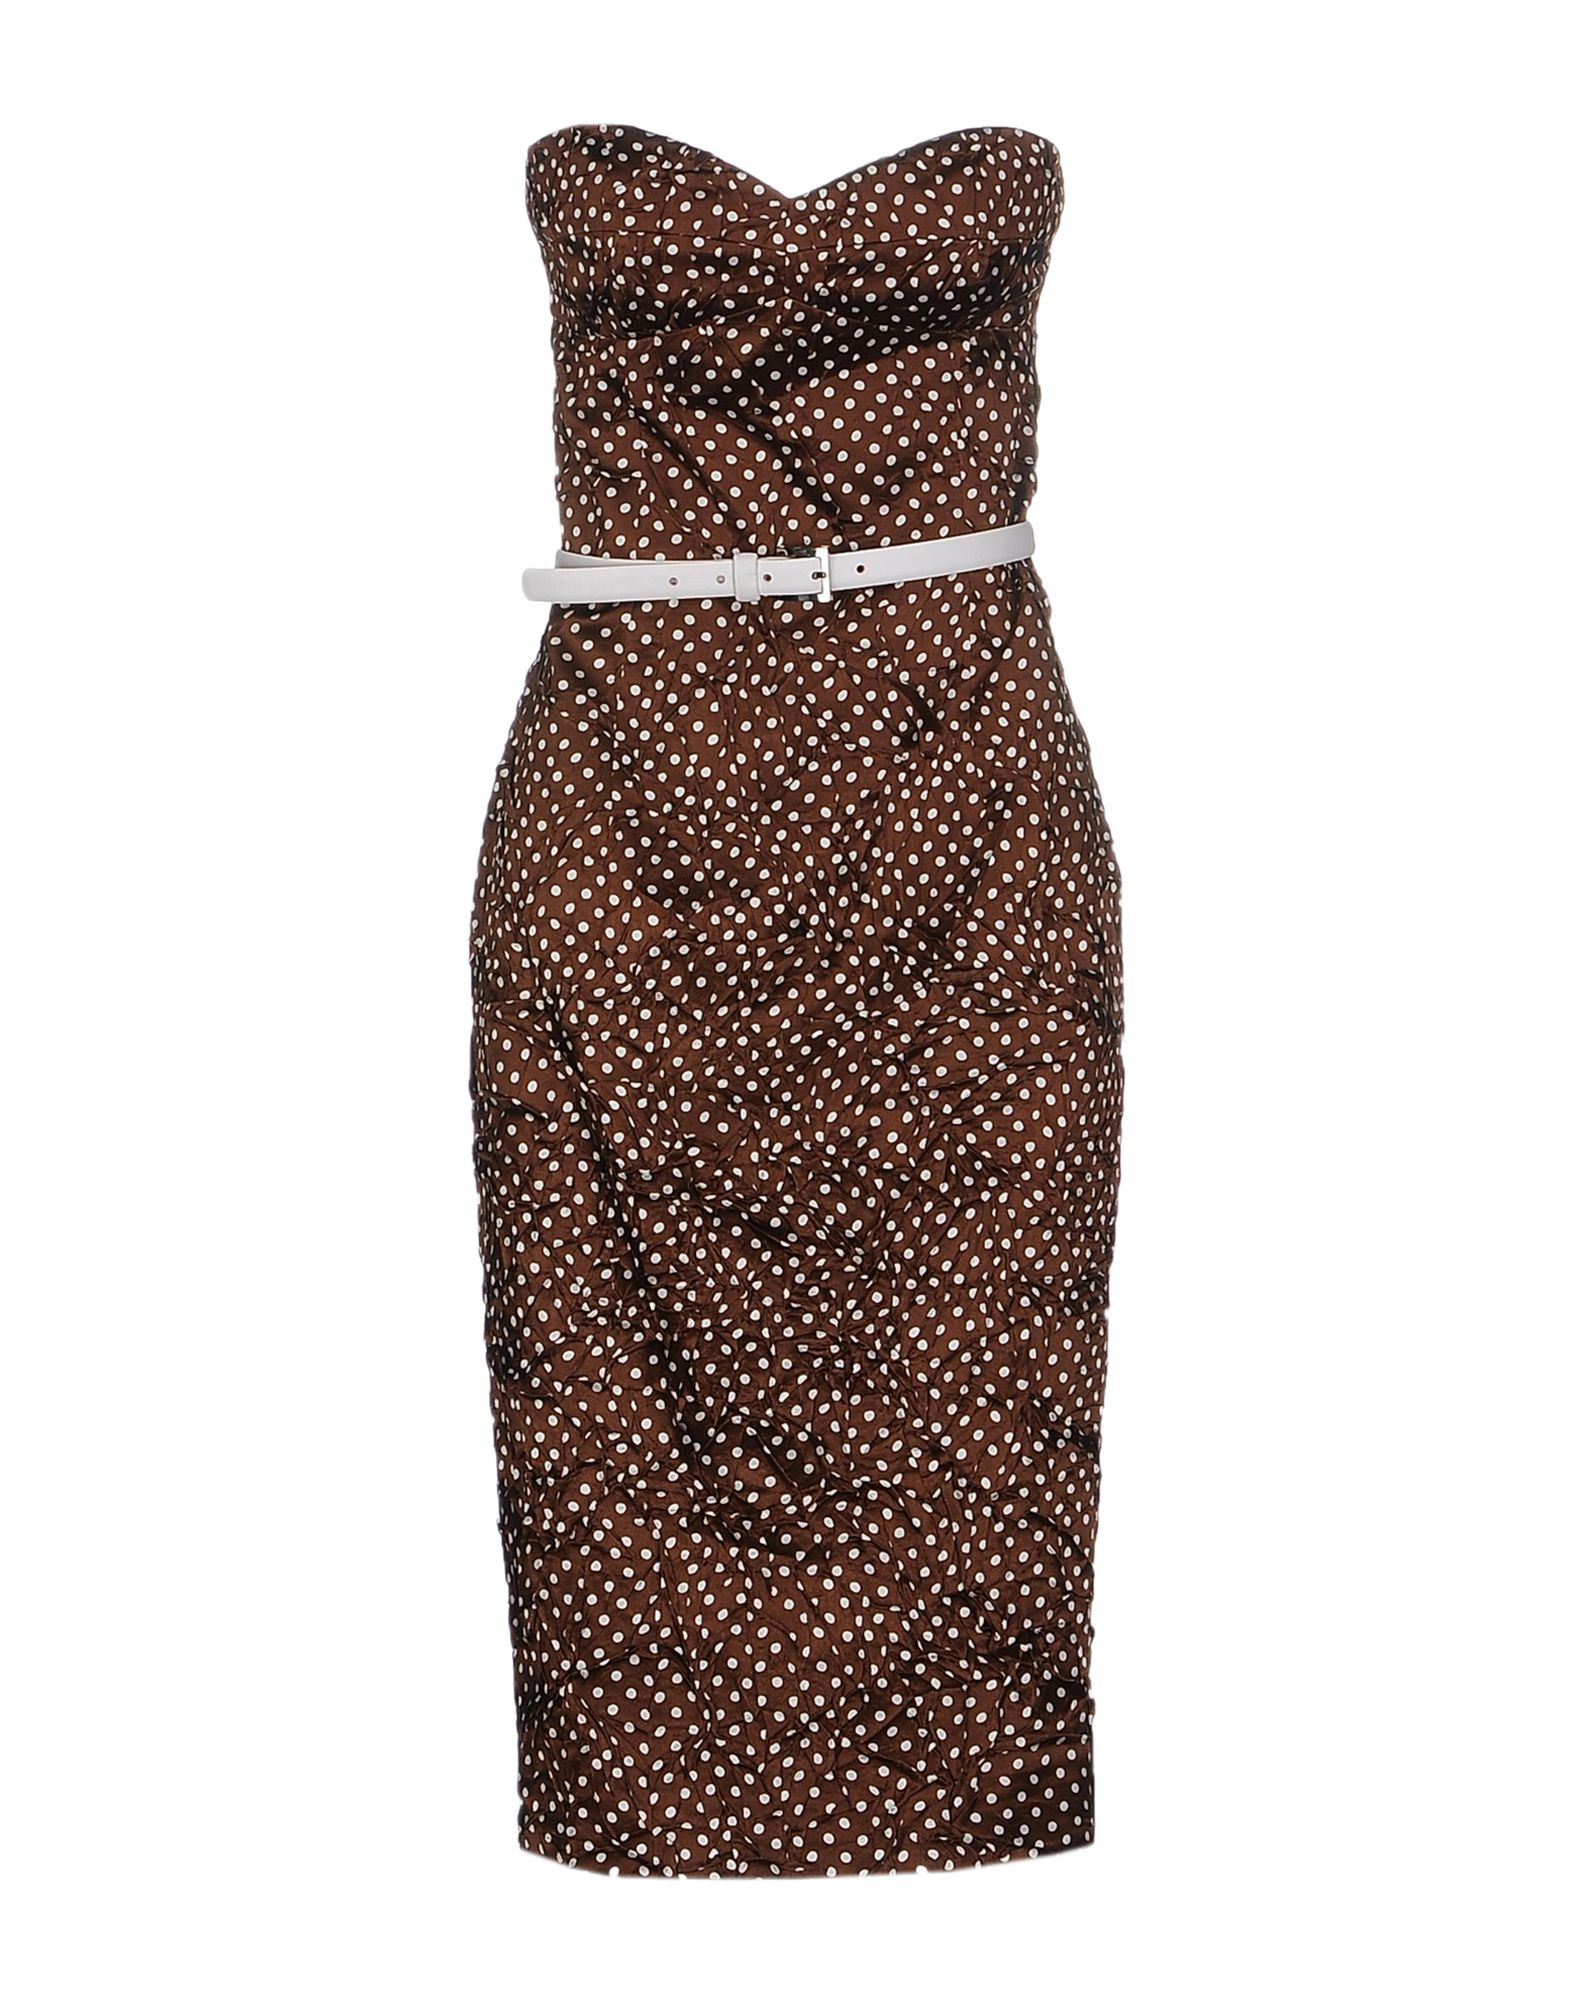 lyst michael kors knee length dress in brown. Black Bedroom Furniture Sets. Home Design Ideas